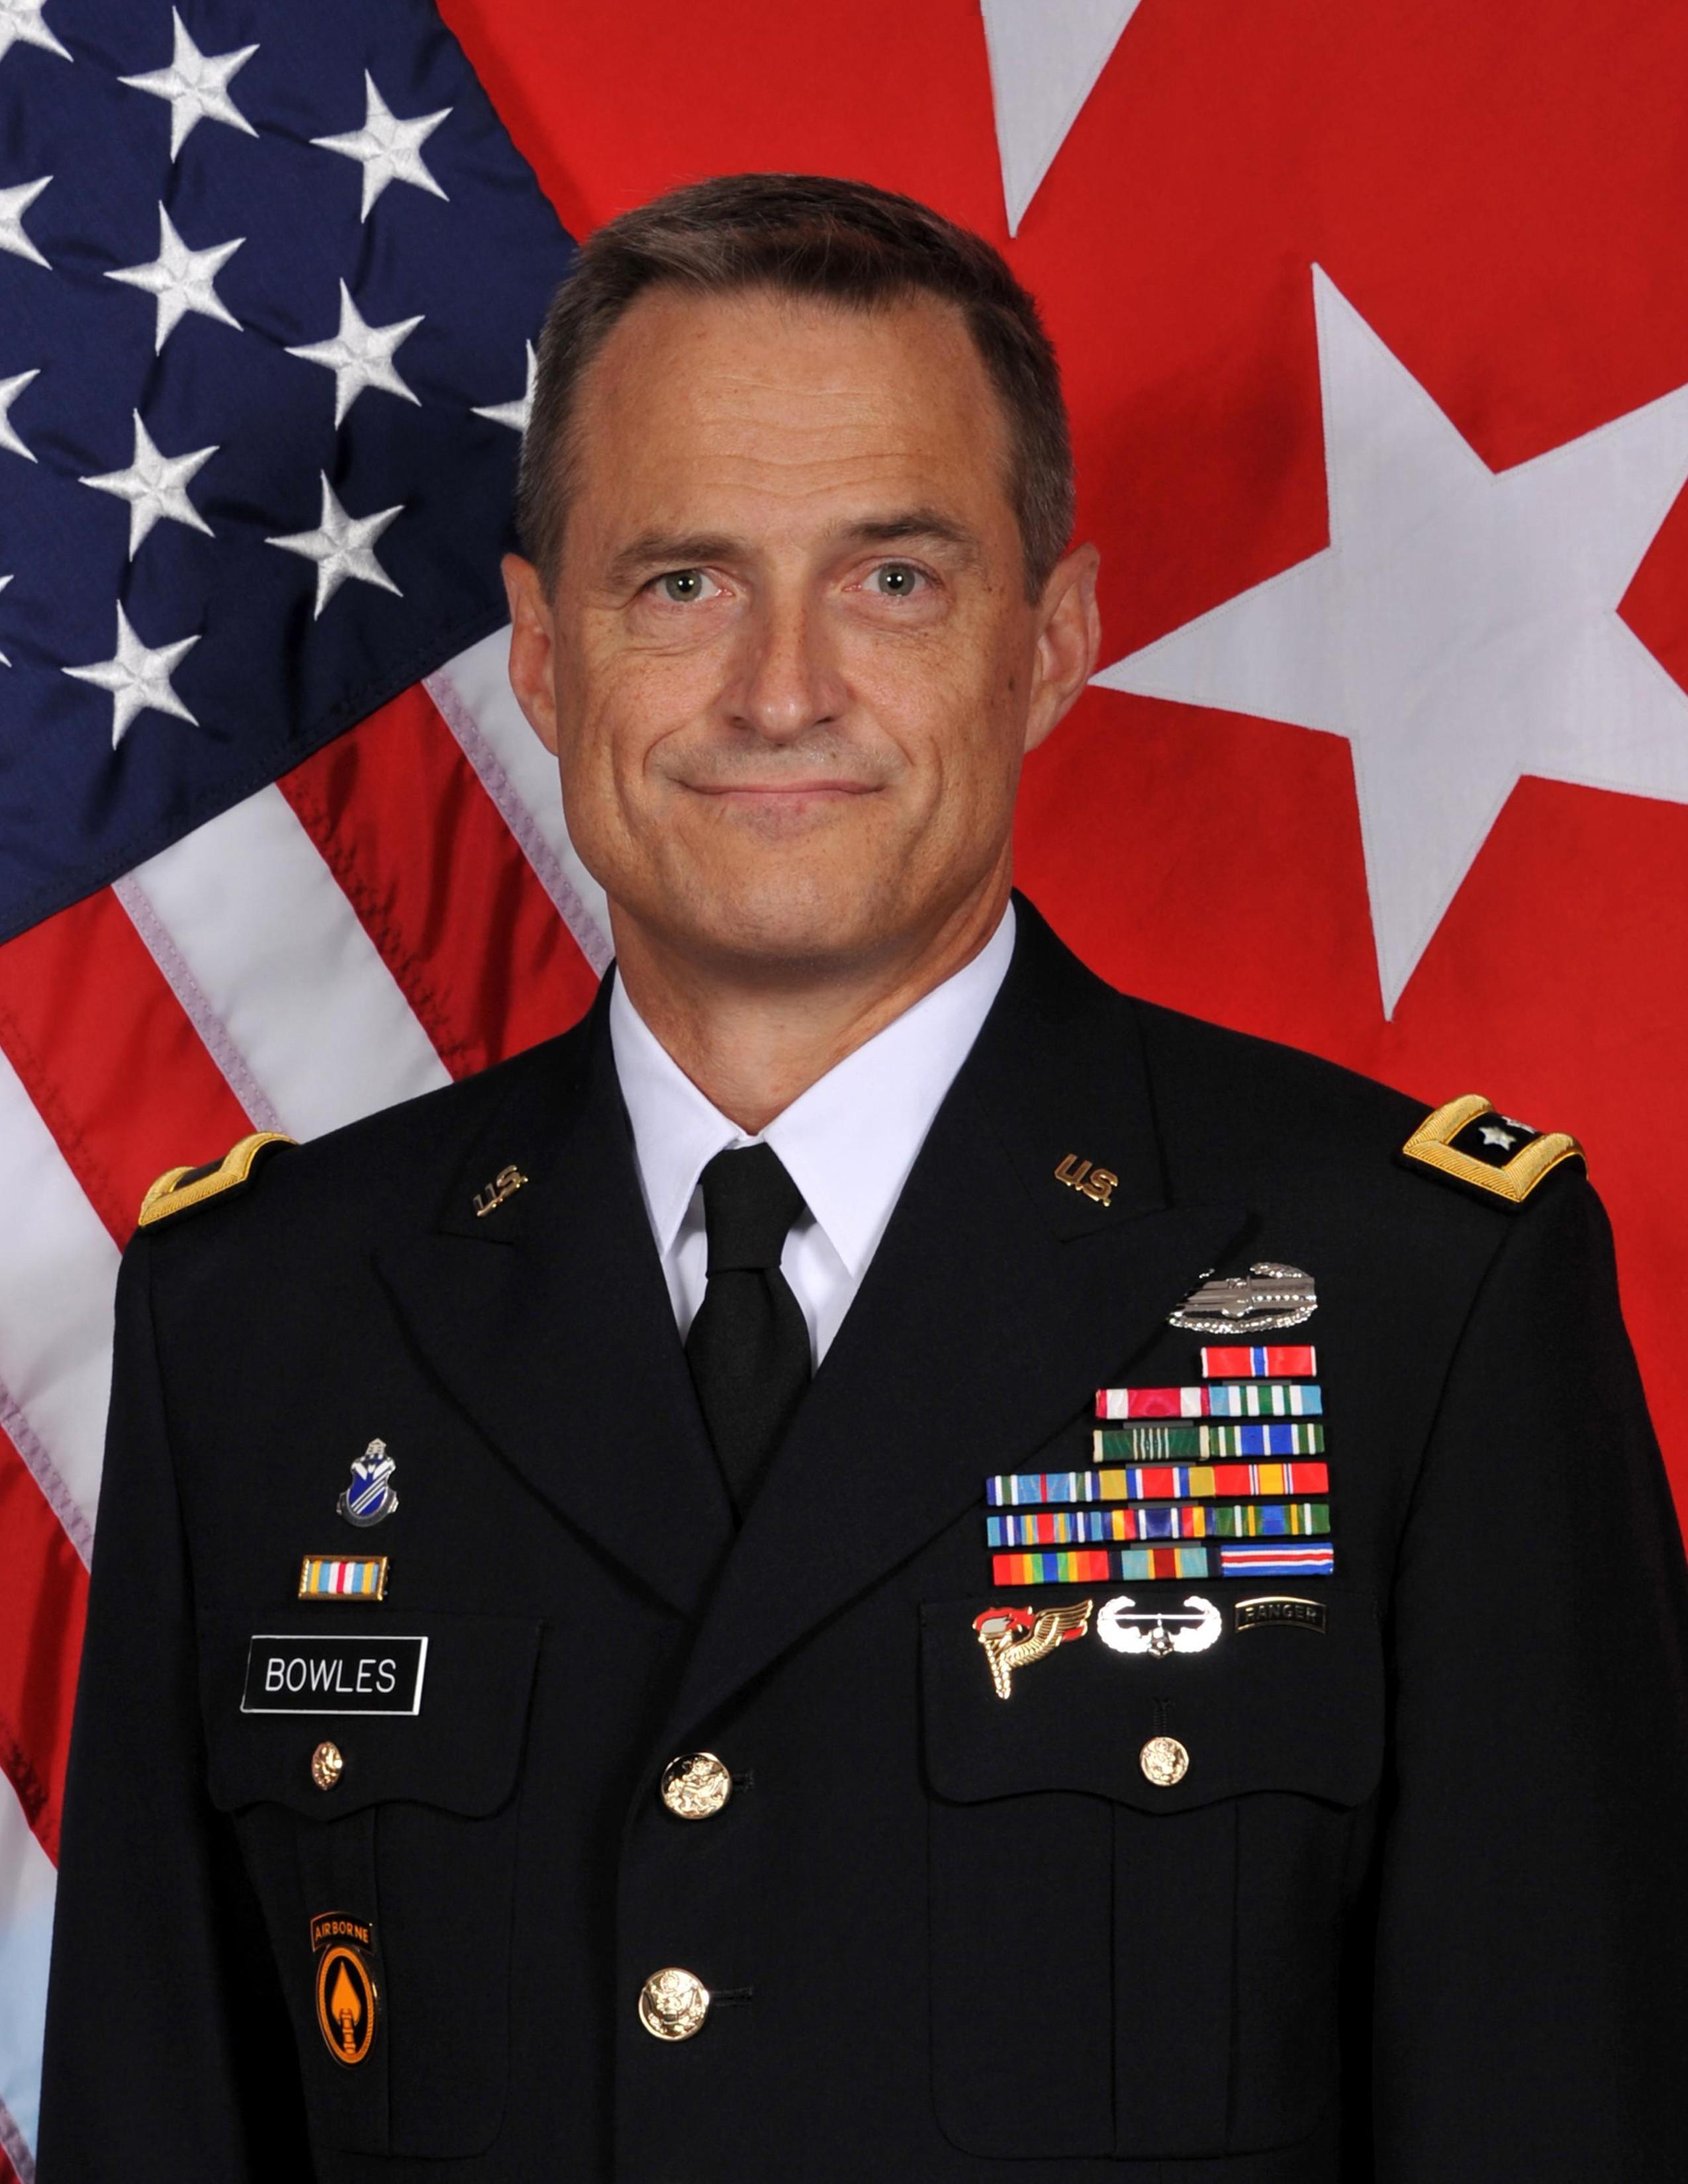 Maj. Gen. Tripp Bowles